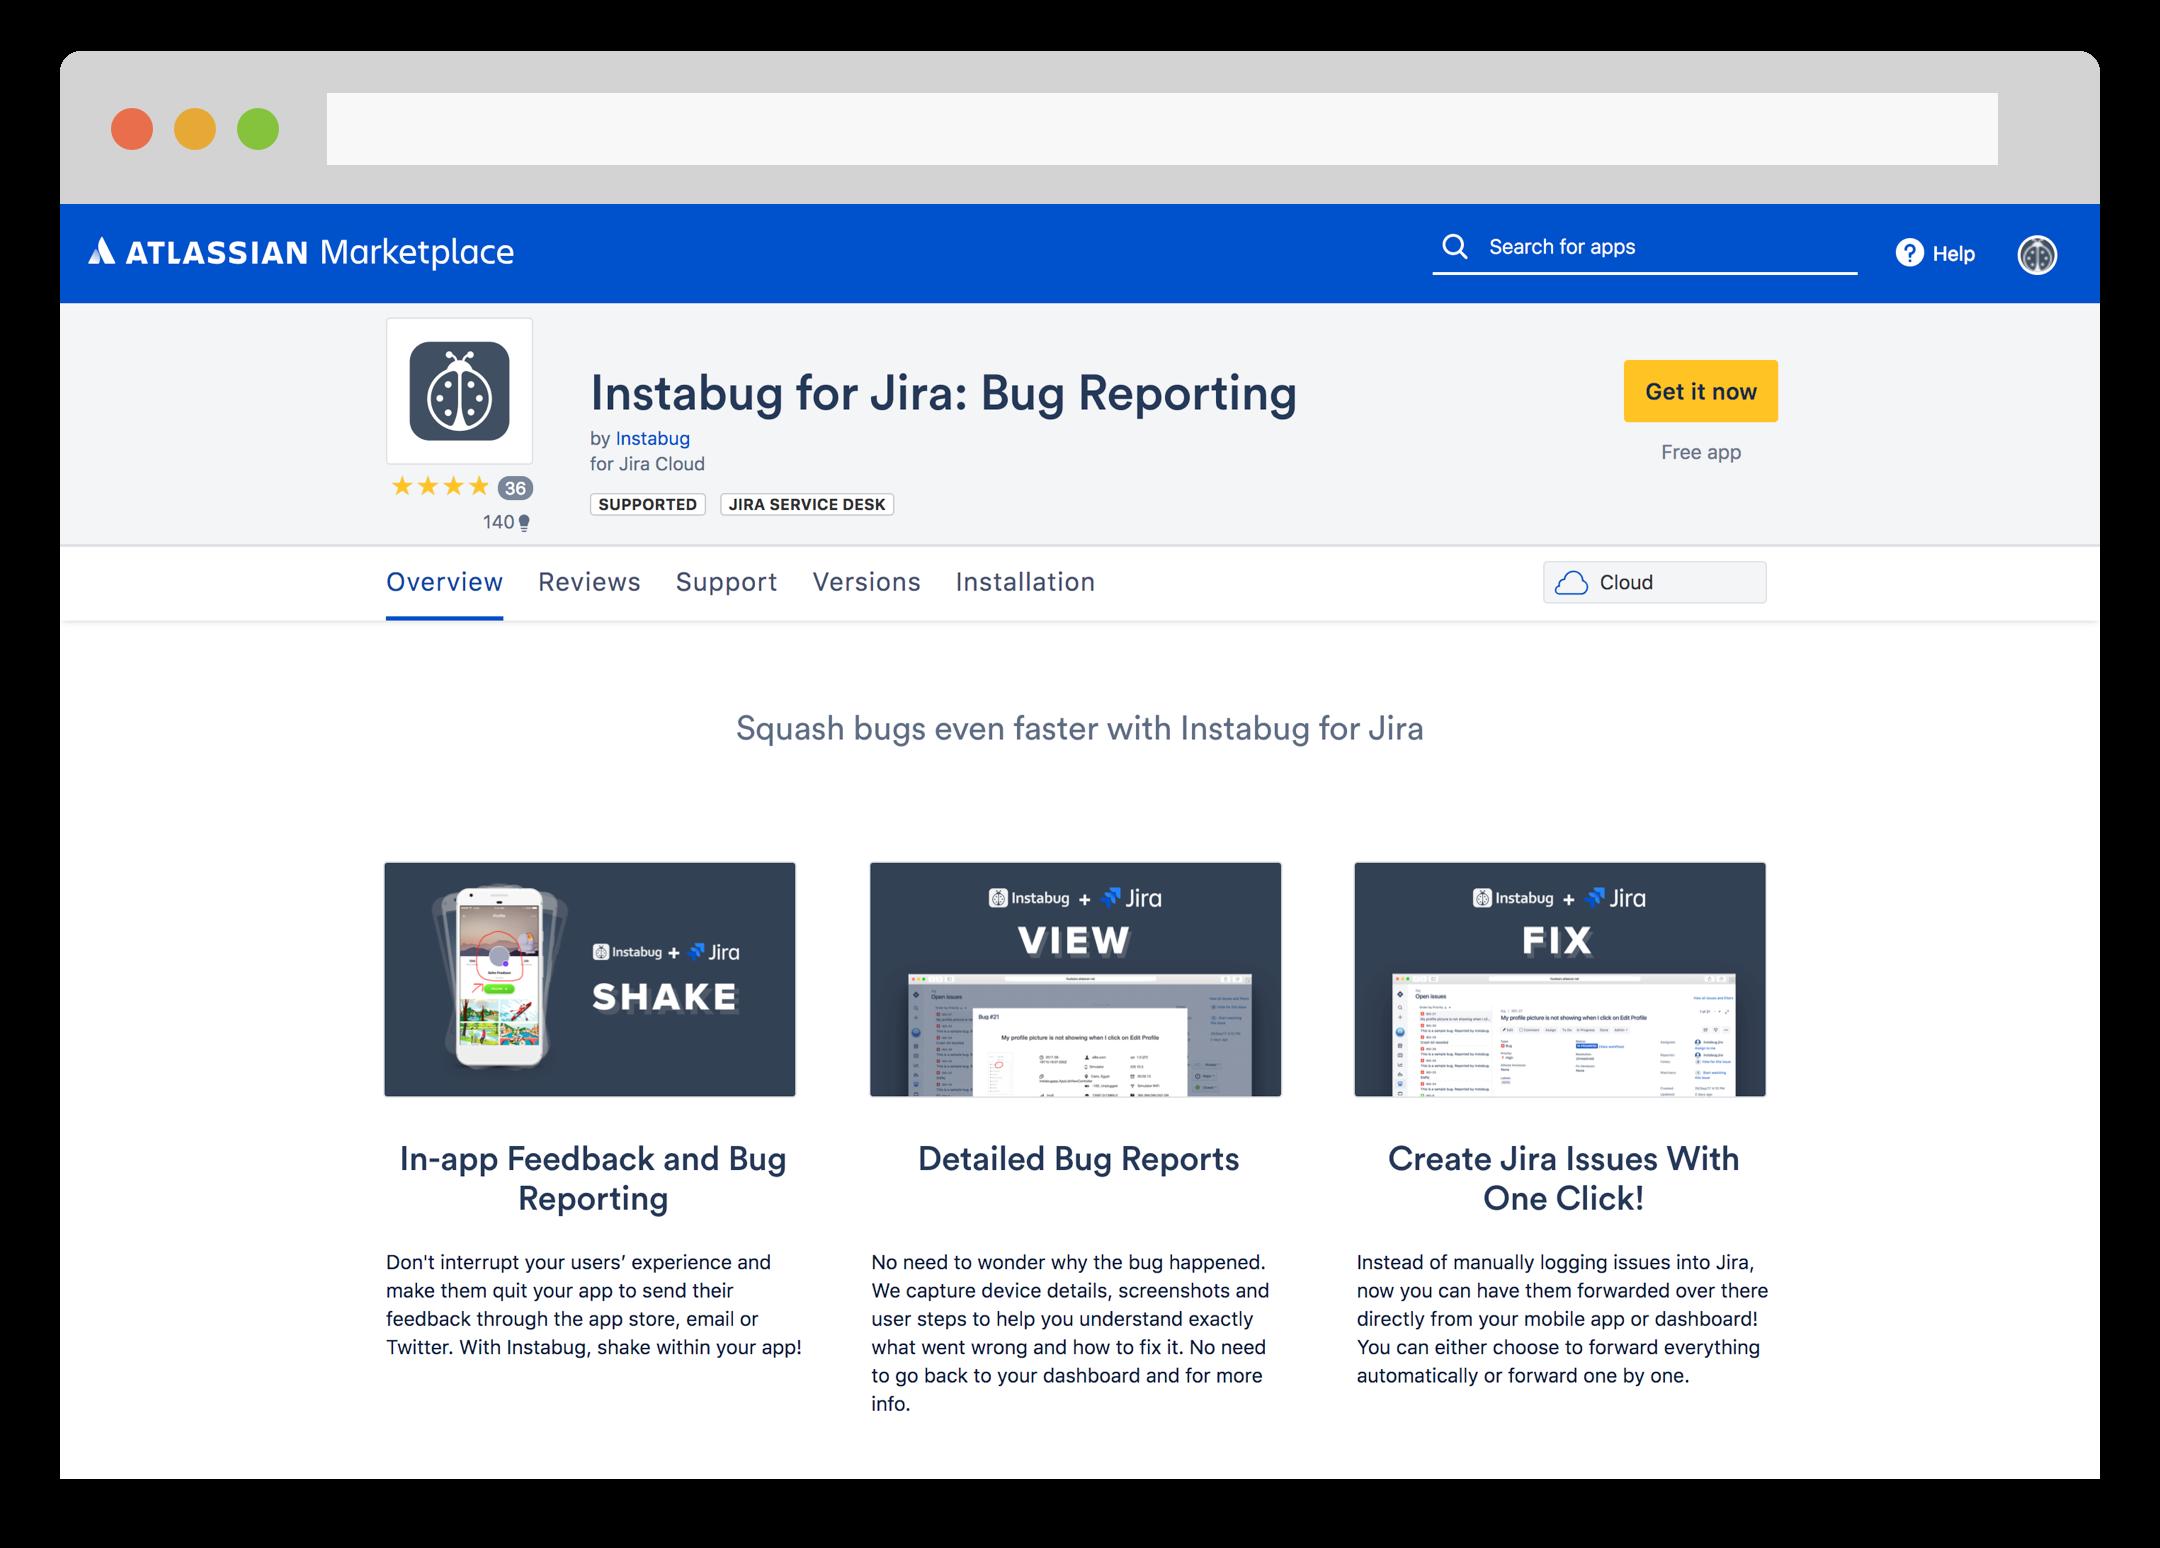 Instabug for JIRA add-on on Atlassian Marketplace